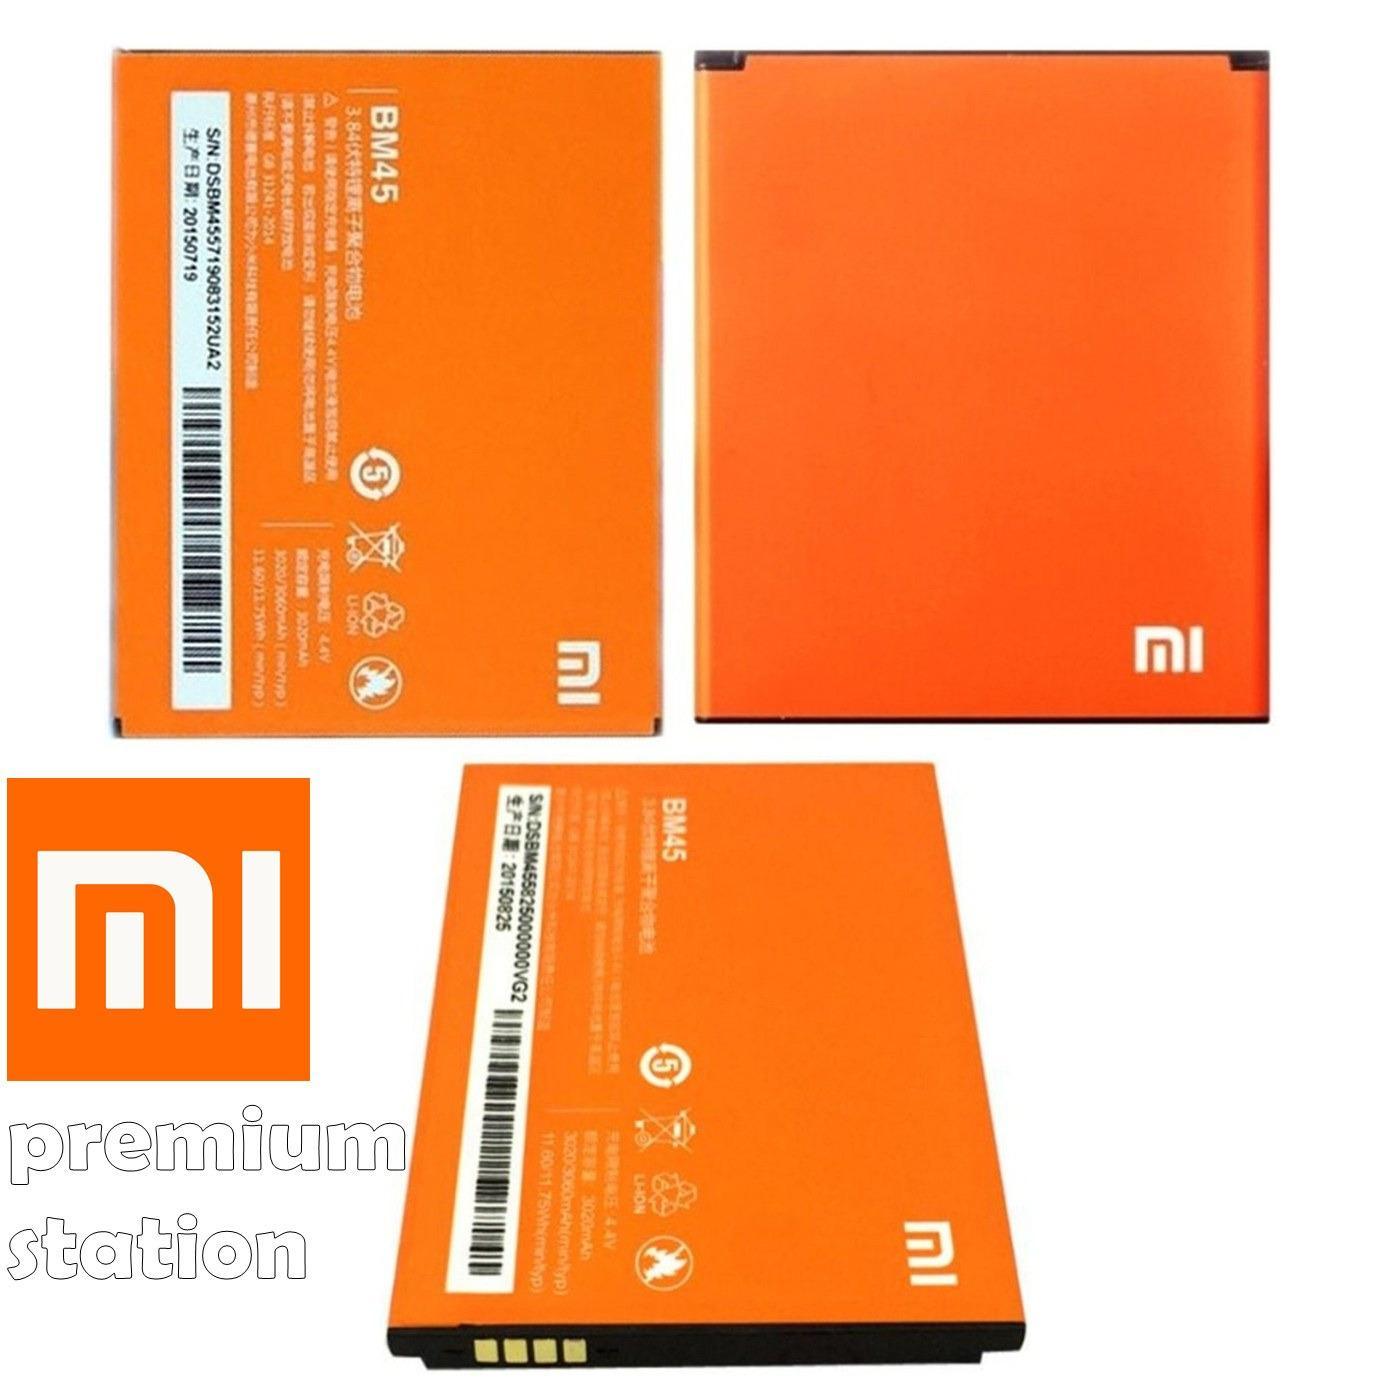 Jual Beli Online Xiaomi Powered Baterai Bm45 Redmi Note 2 3020 Mah Origiinal